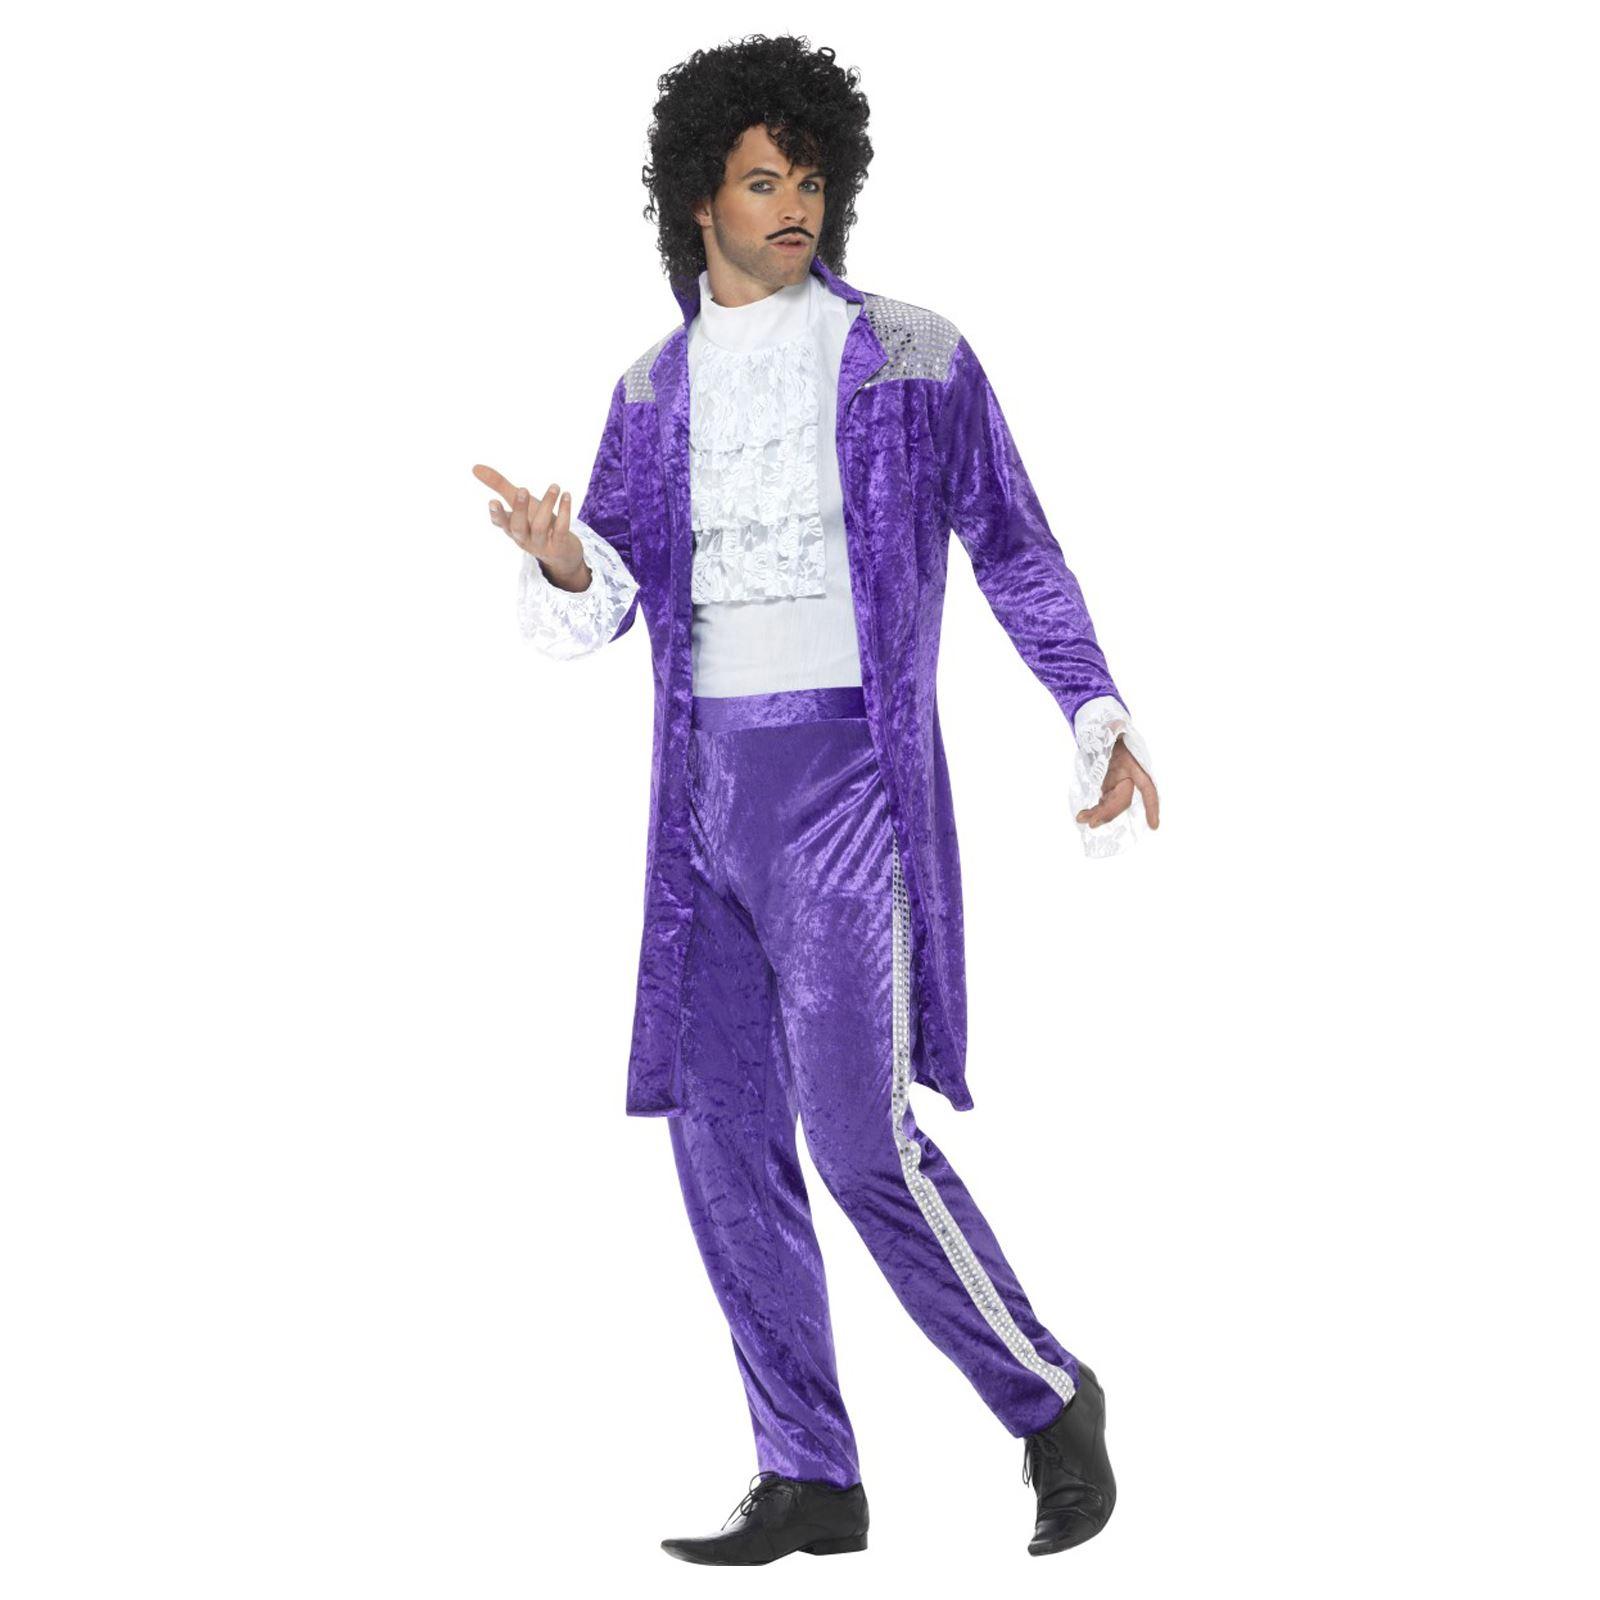 907363eea0 80s Mens Purple Musician Prince Queen Suit Jacket Trousers Fancy ...